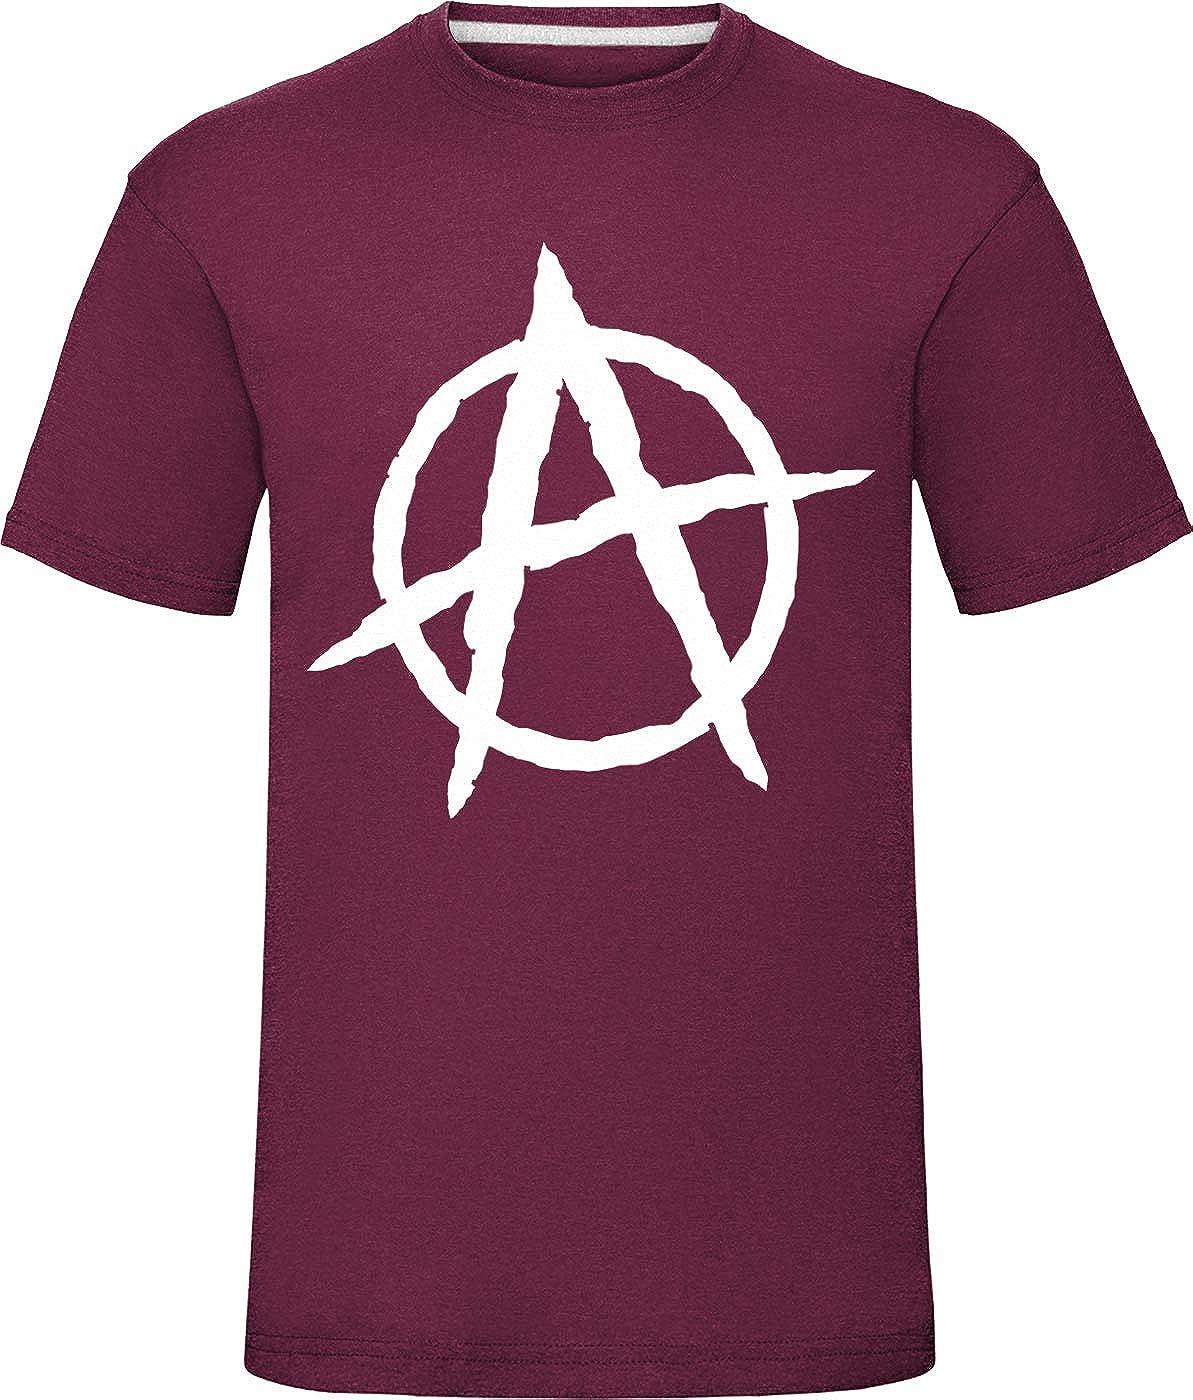 laylawson Hommes Anarchie A Symbole T-Shirt